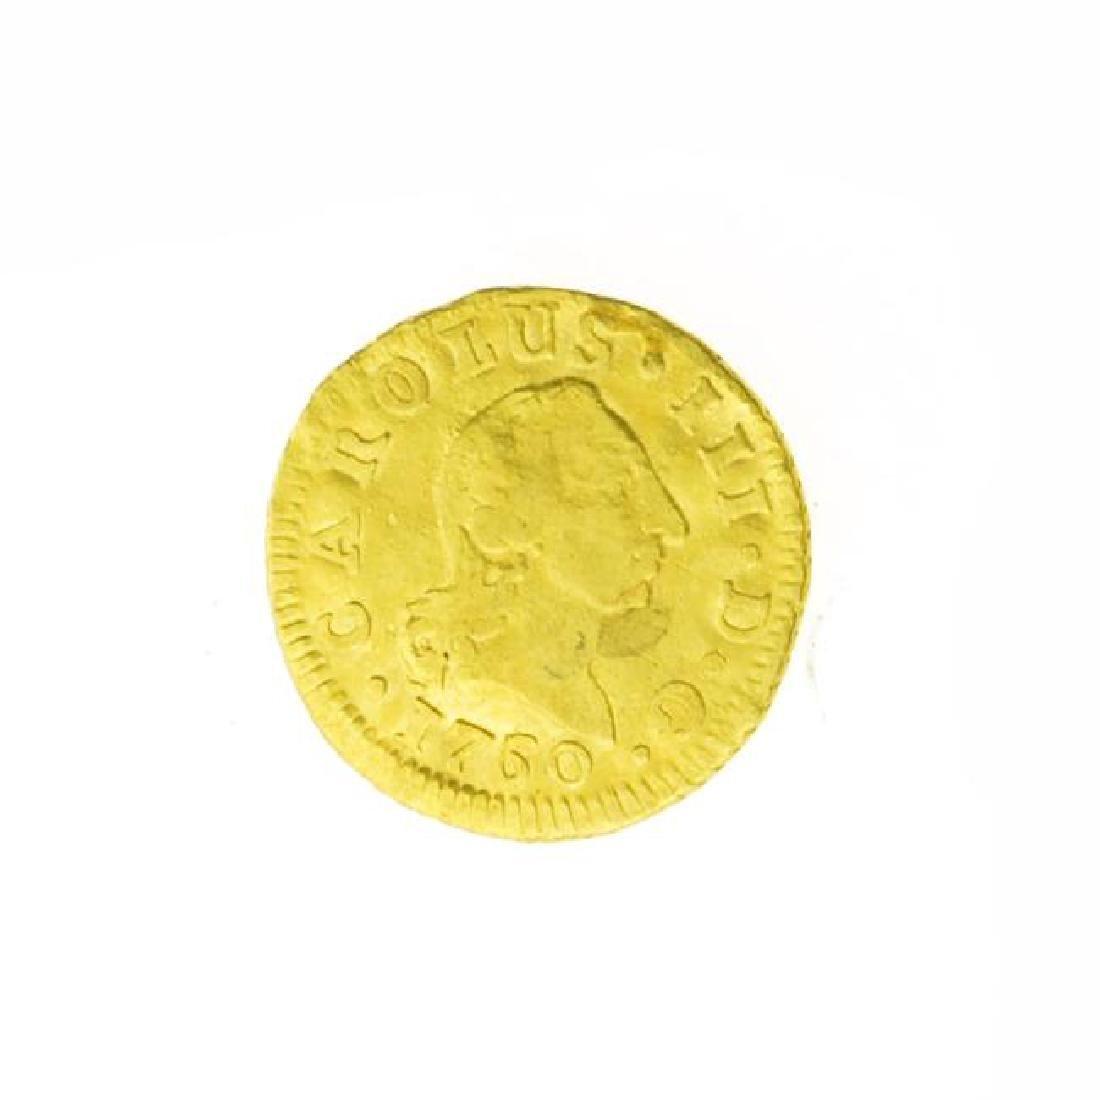 1760 Spanish Cob Gold Coin (JG)